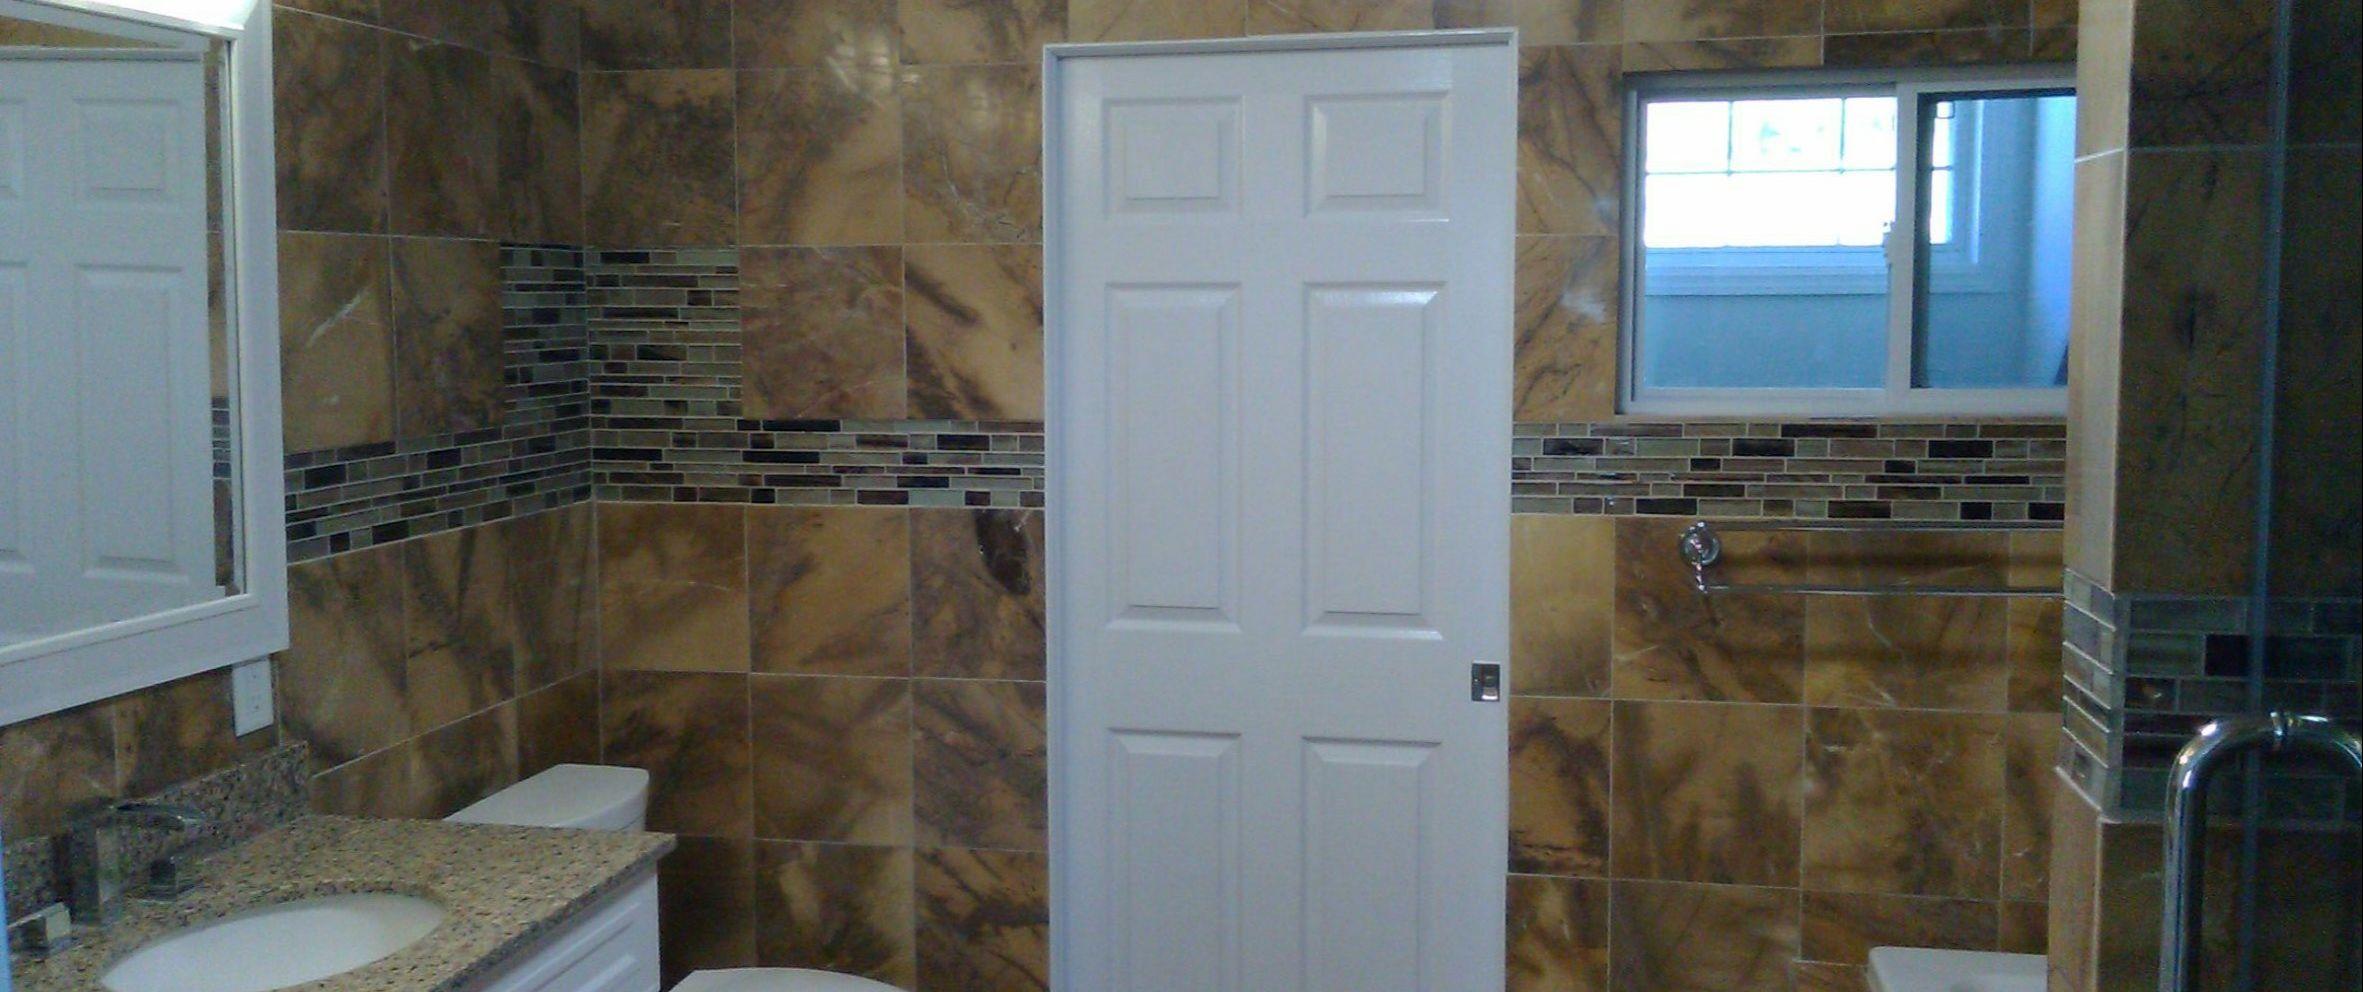 Bathroom Remodeling Birmingham Al | Better Built Craftsman Remodeling Home Repair Home